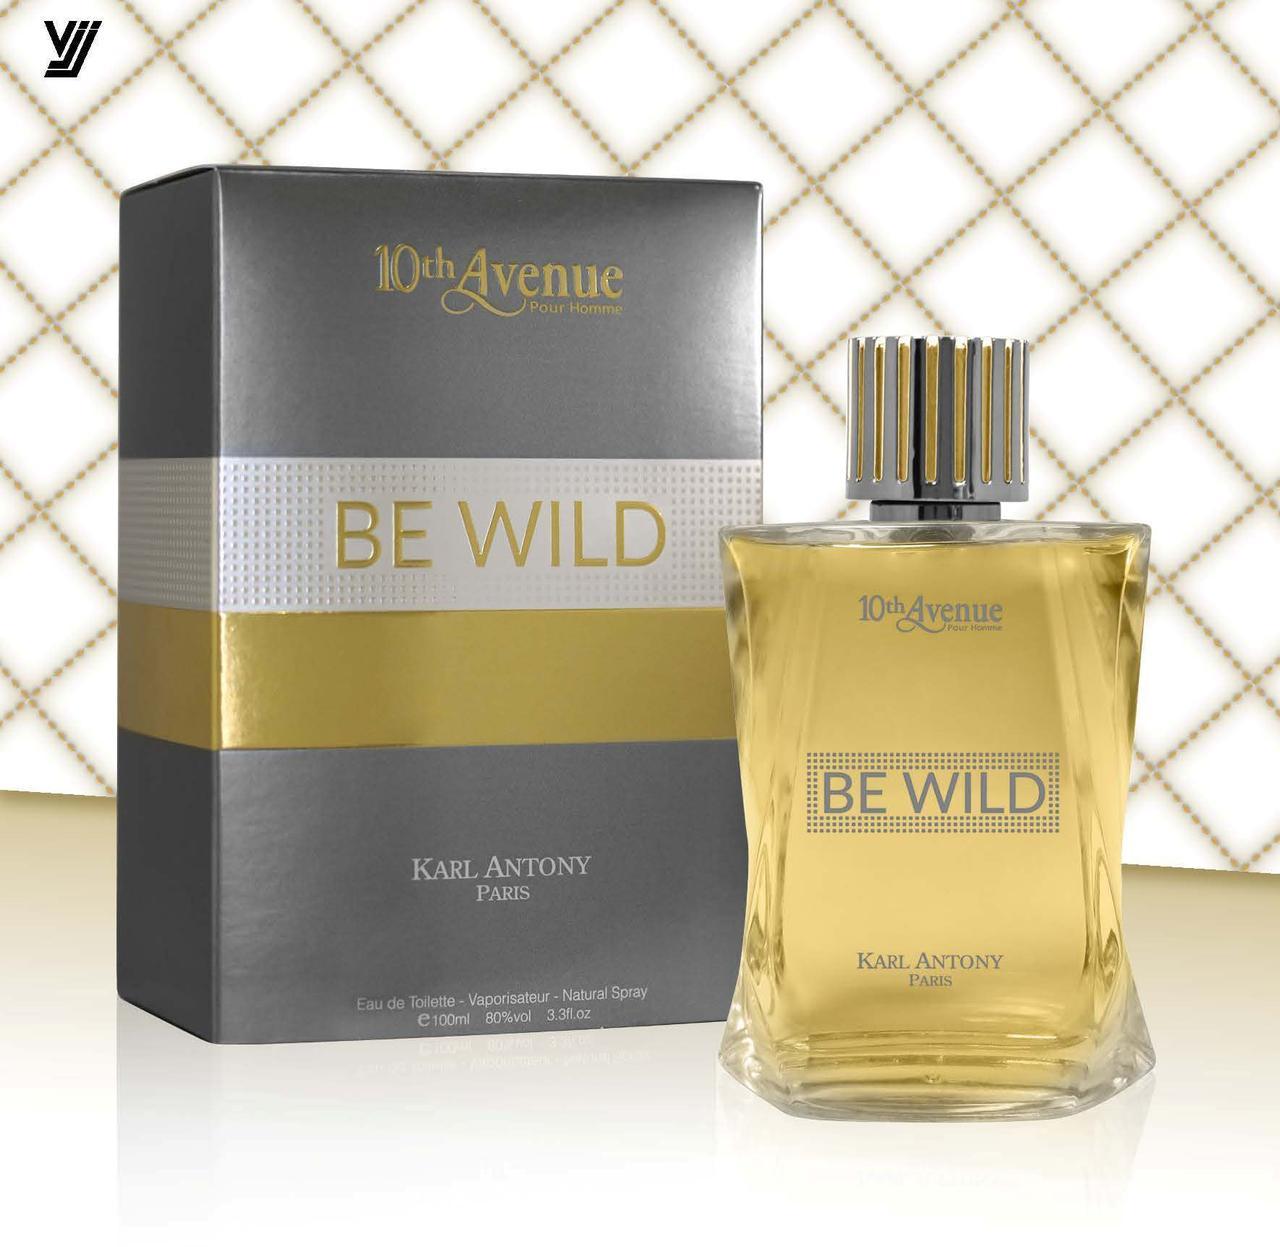 Karl Antony 10th Avenue Be Wild